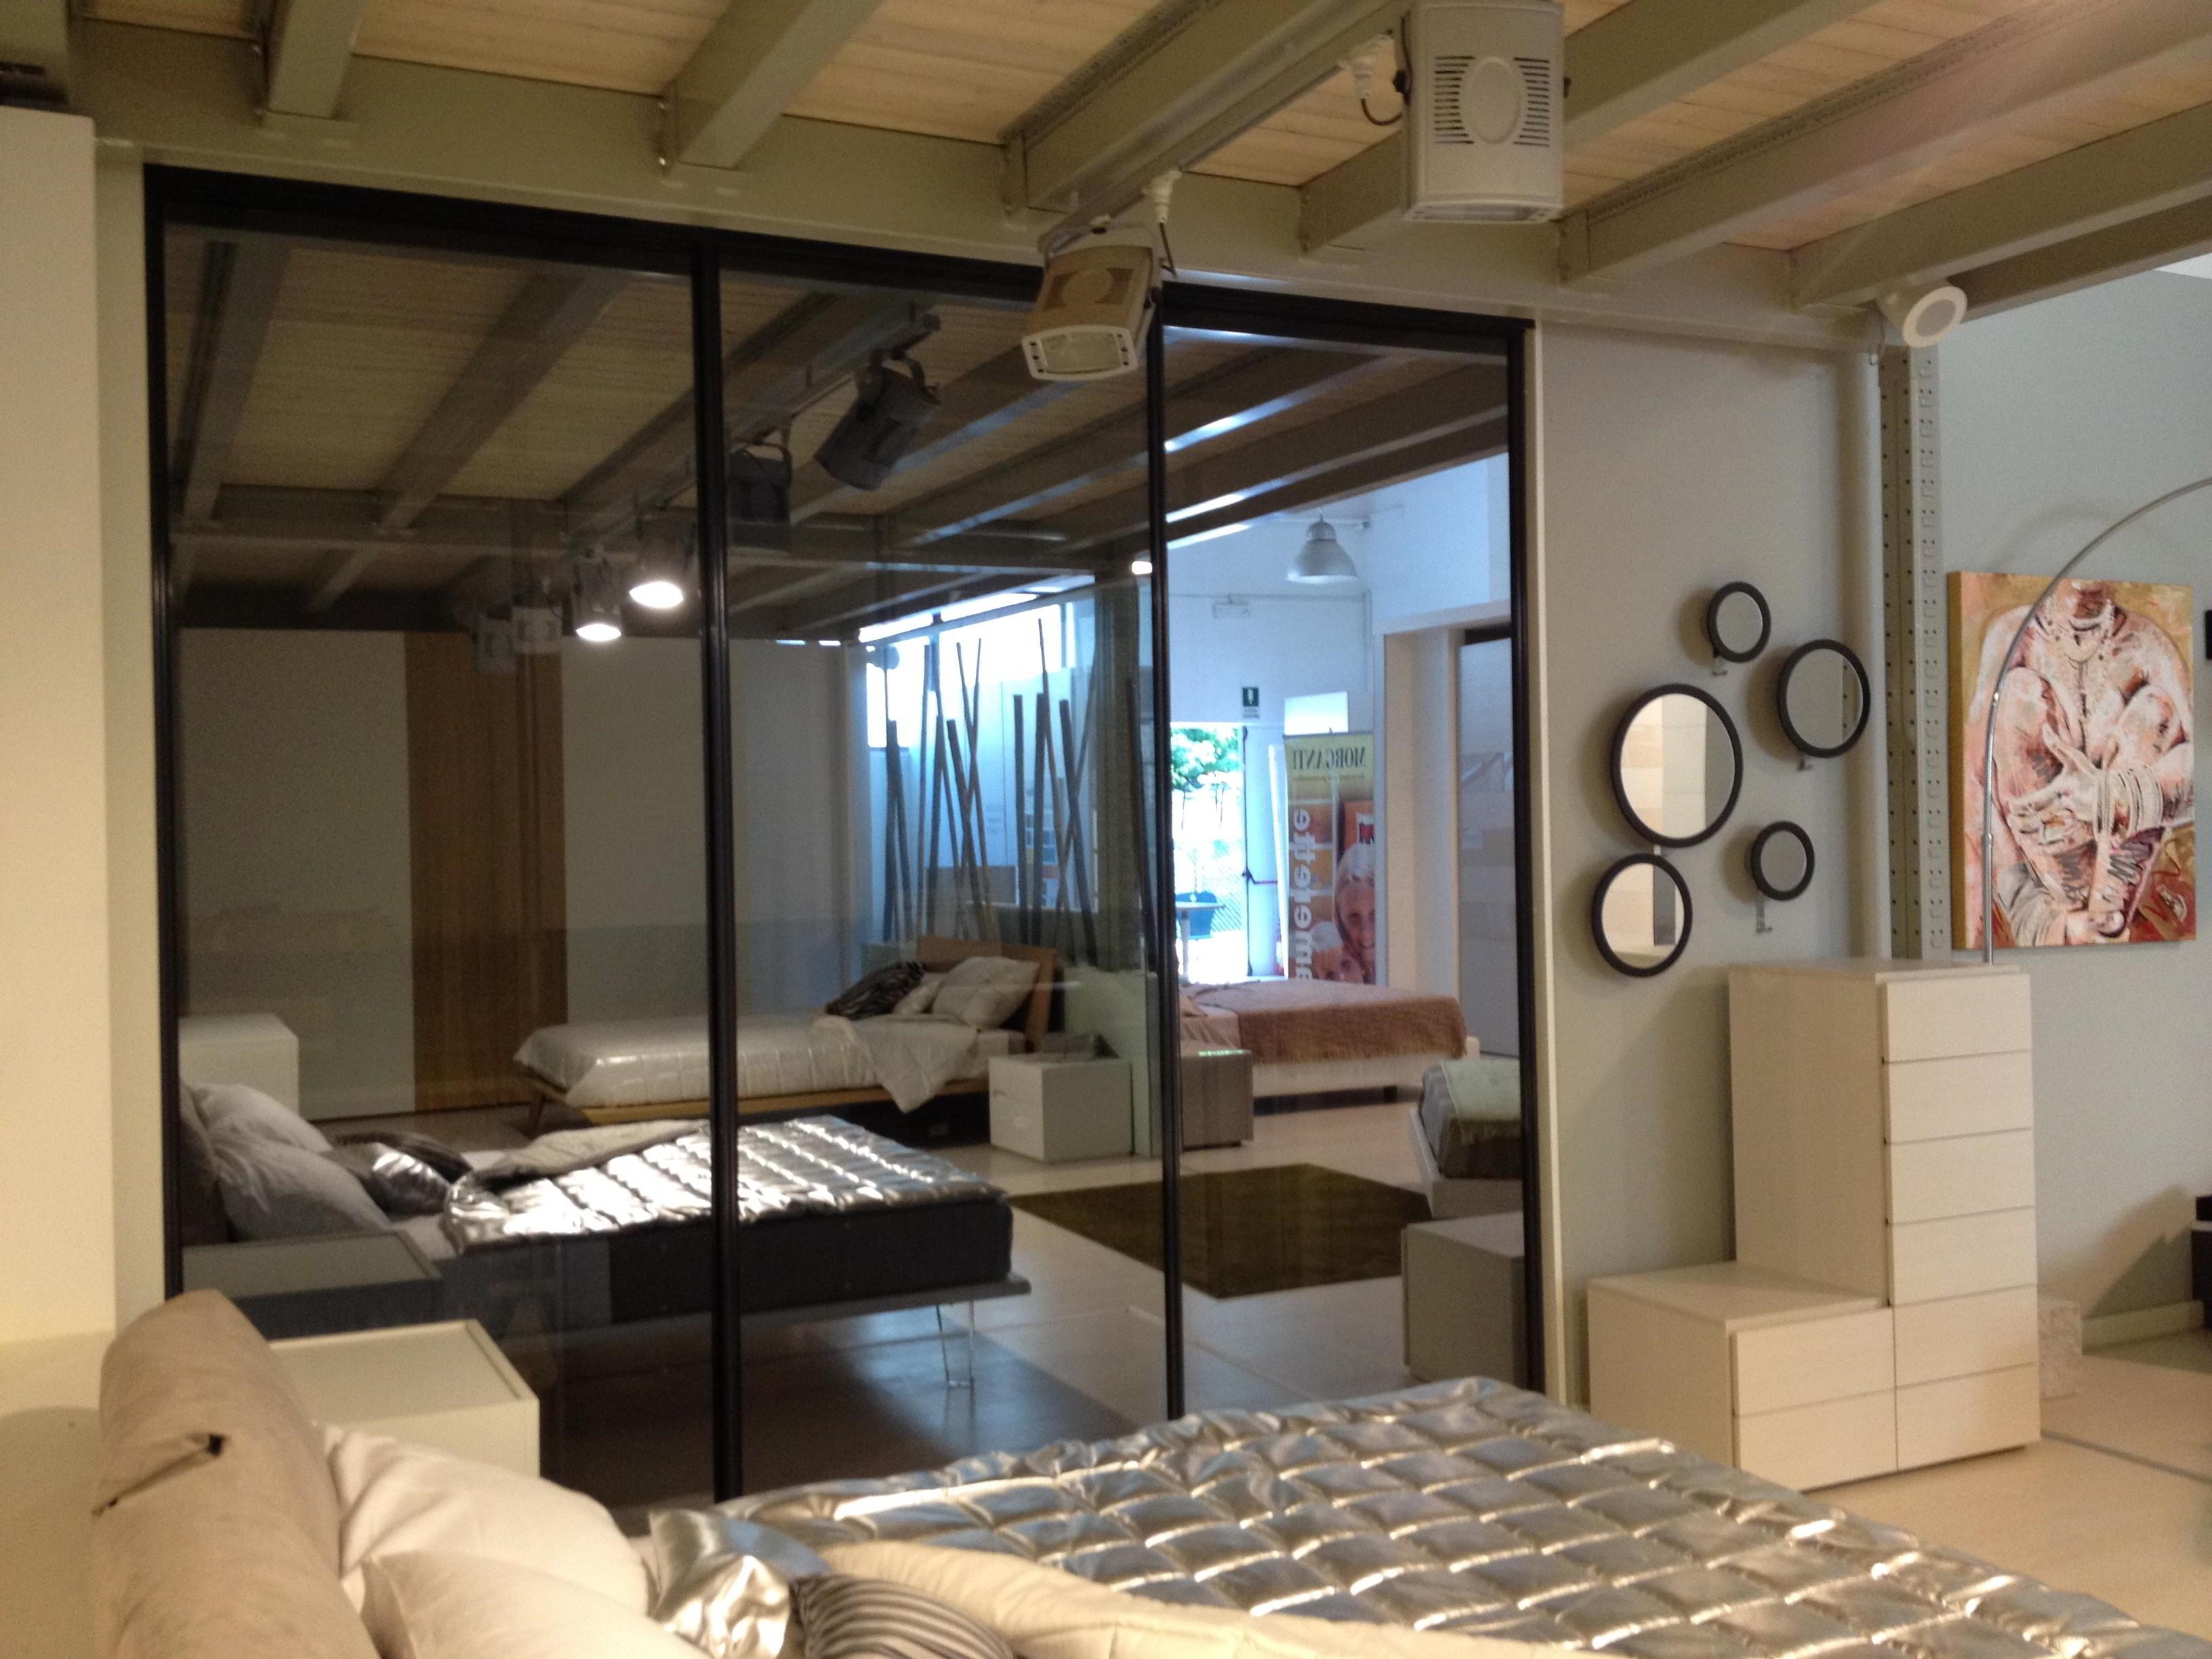 Porte scorrevoli round zemma per cabina armadio armadi for Cabina armadio